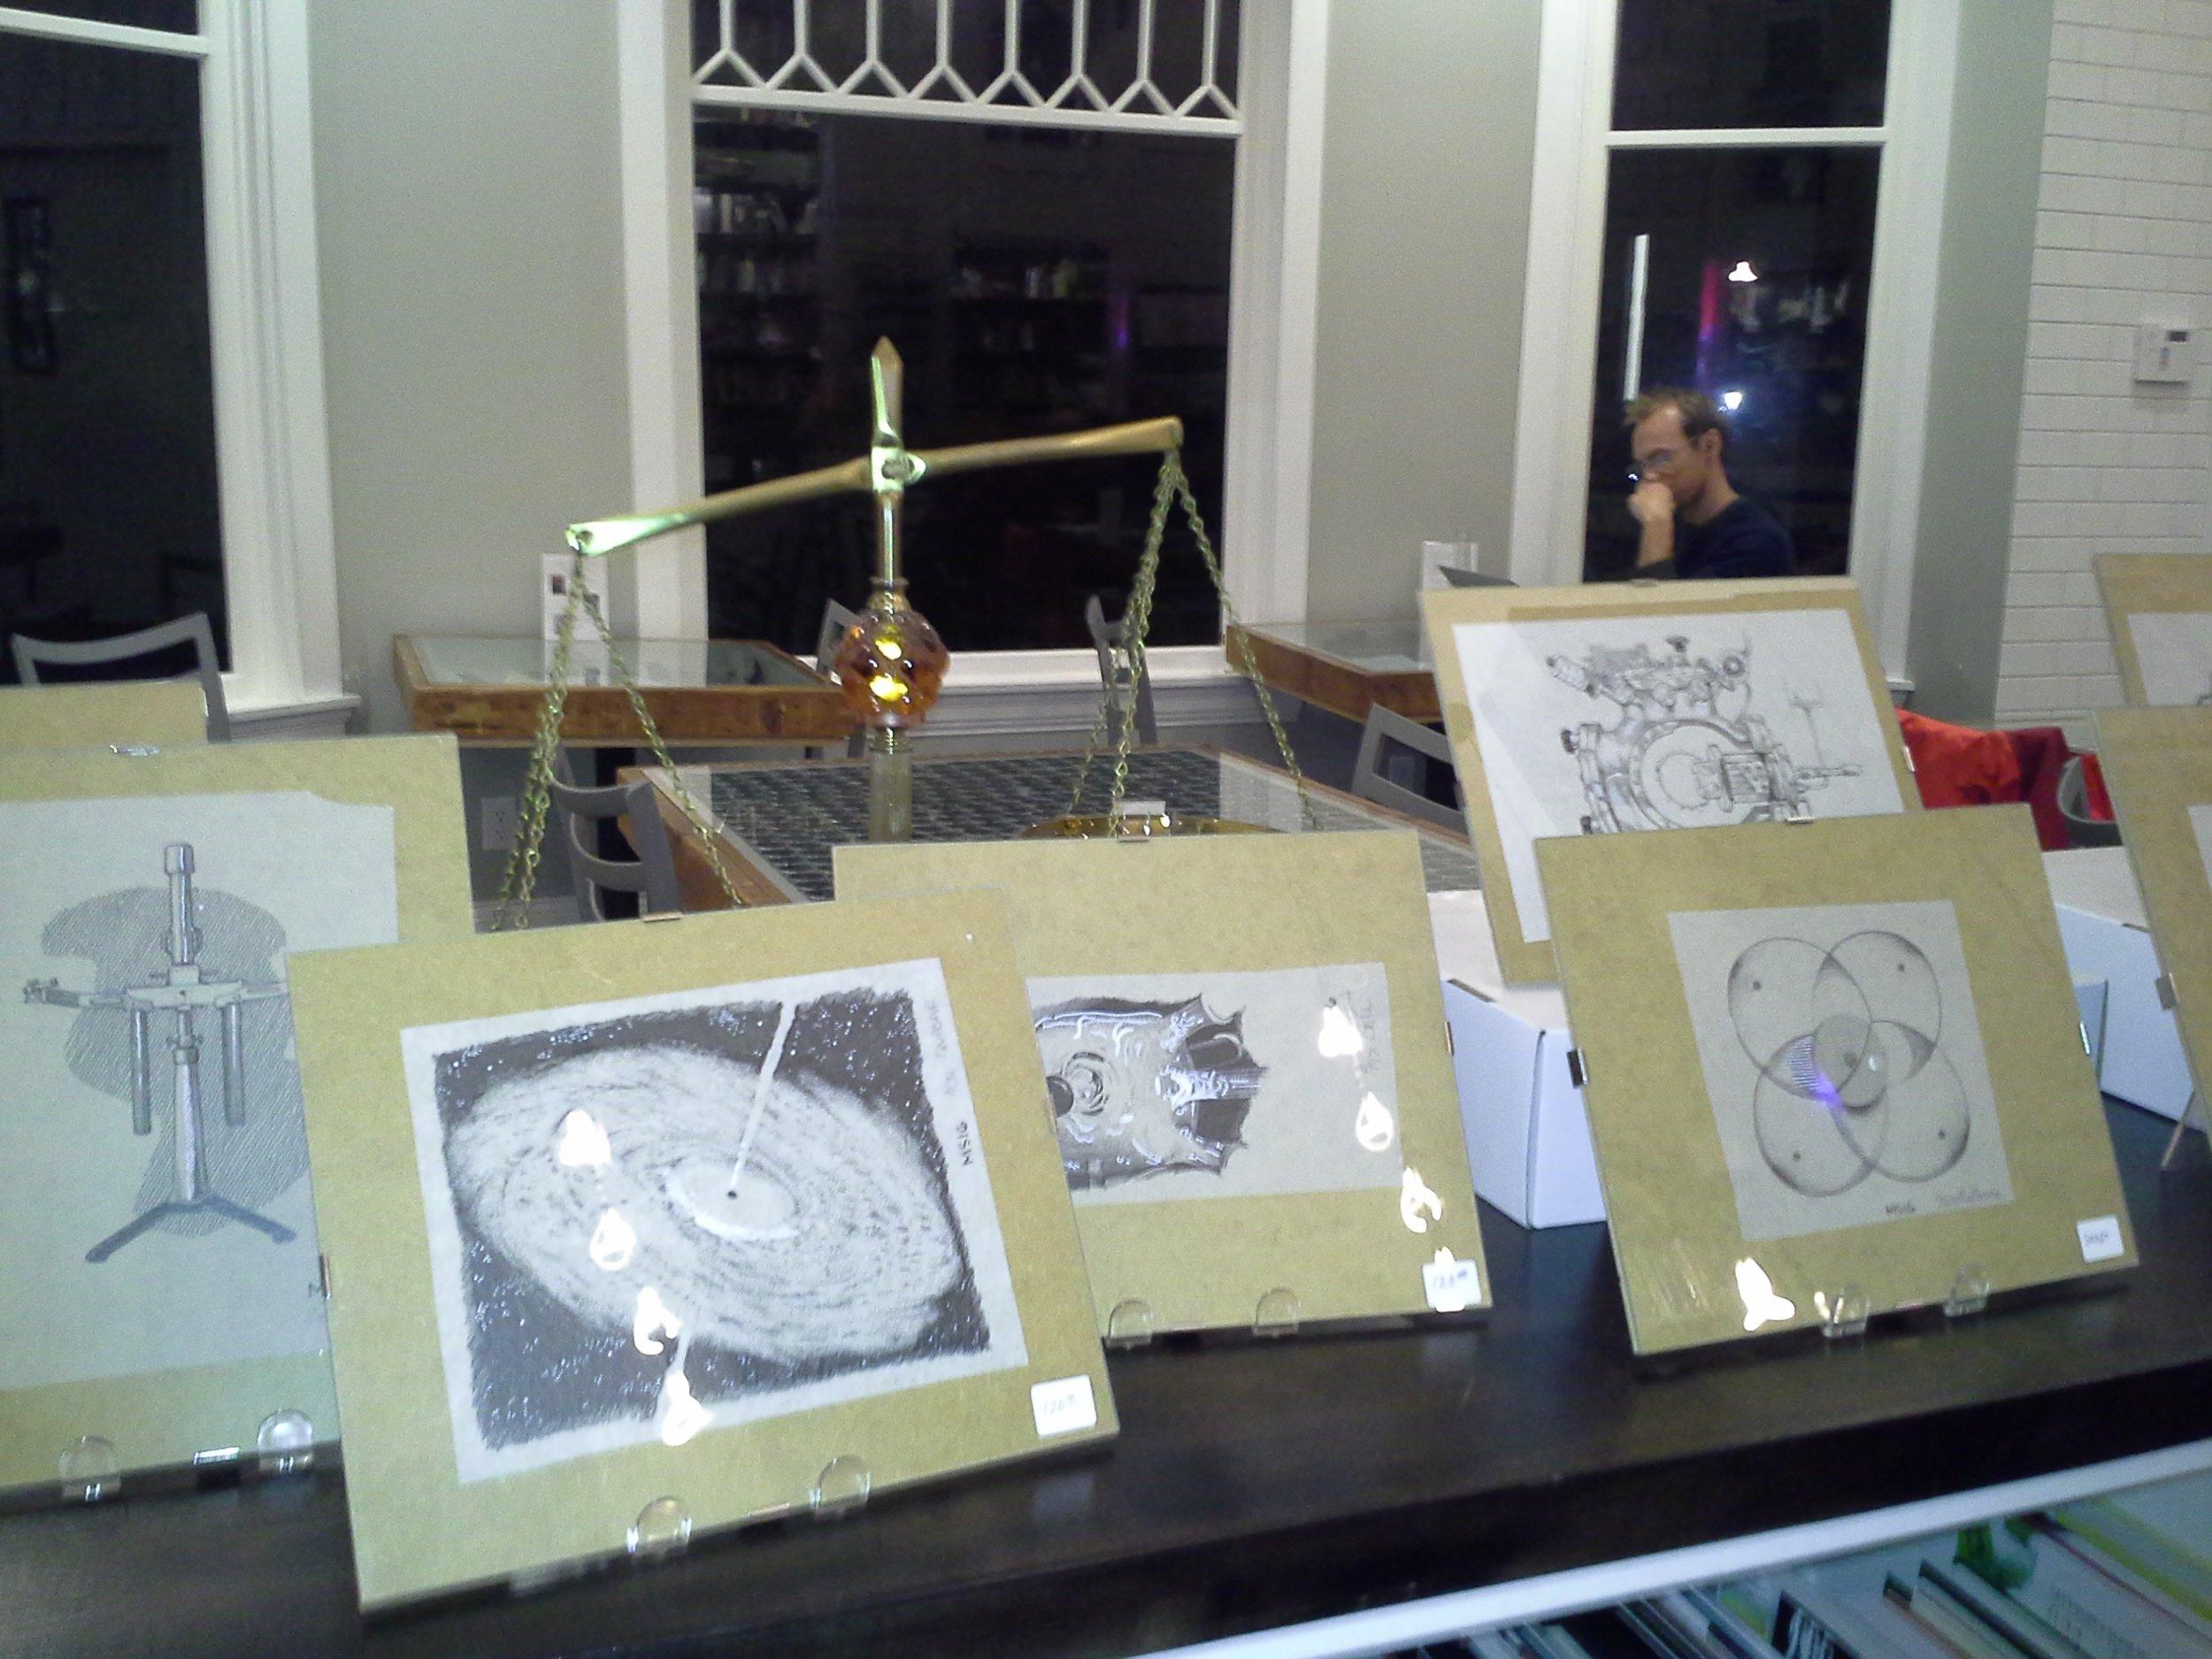 Matt Schmidt's artwork on display at Ada's Books.